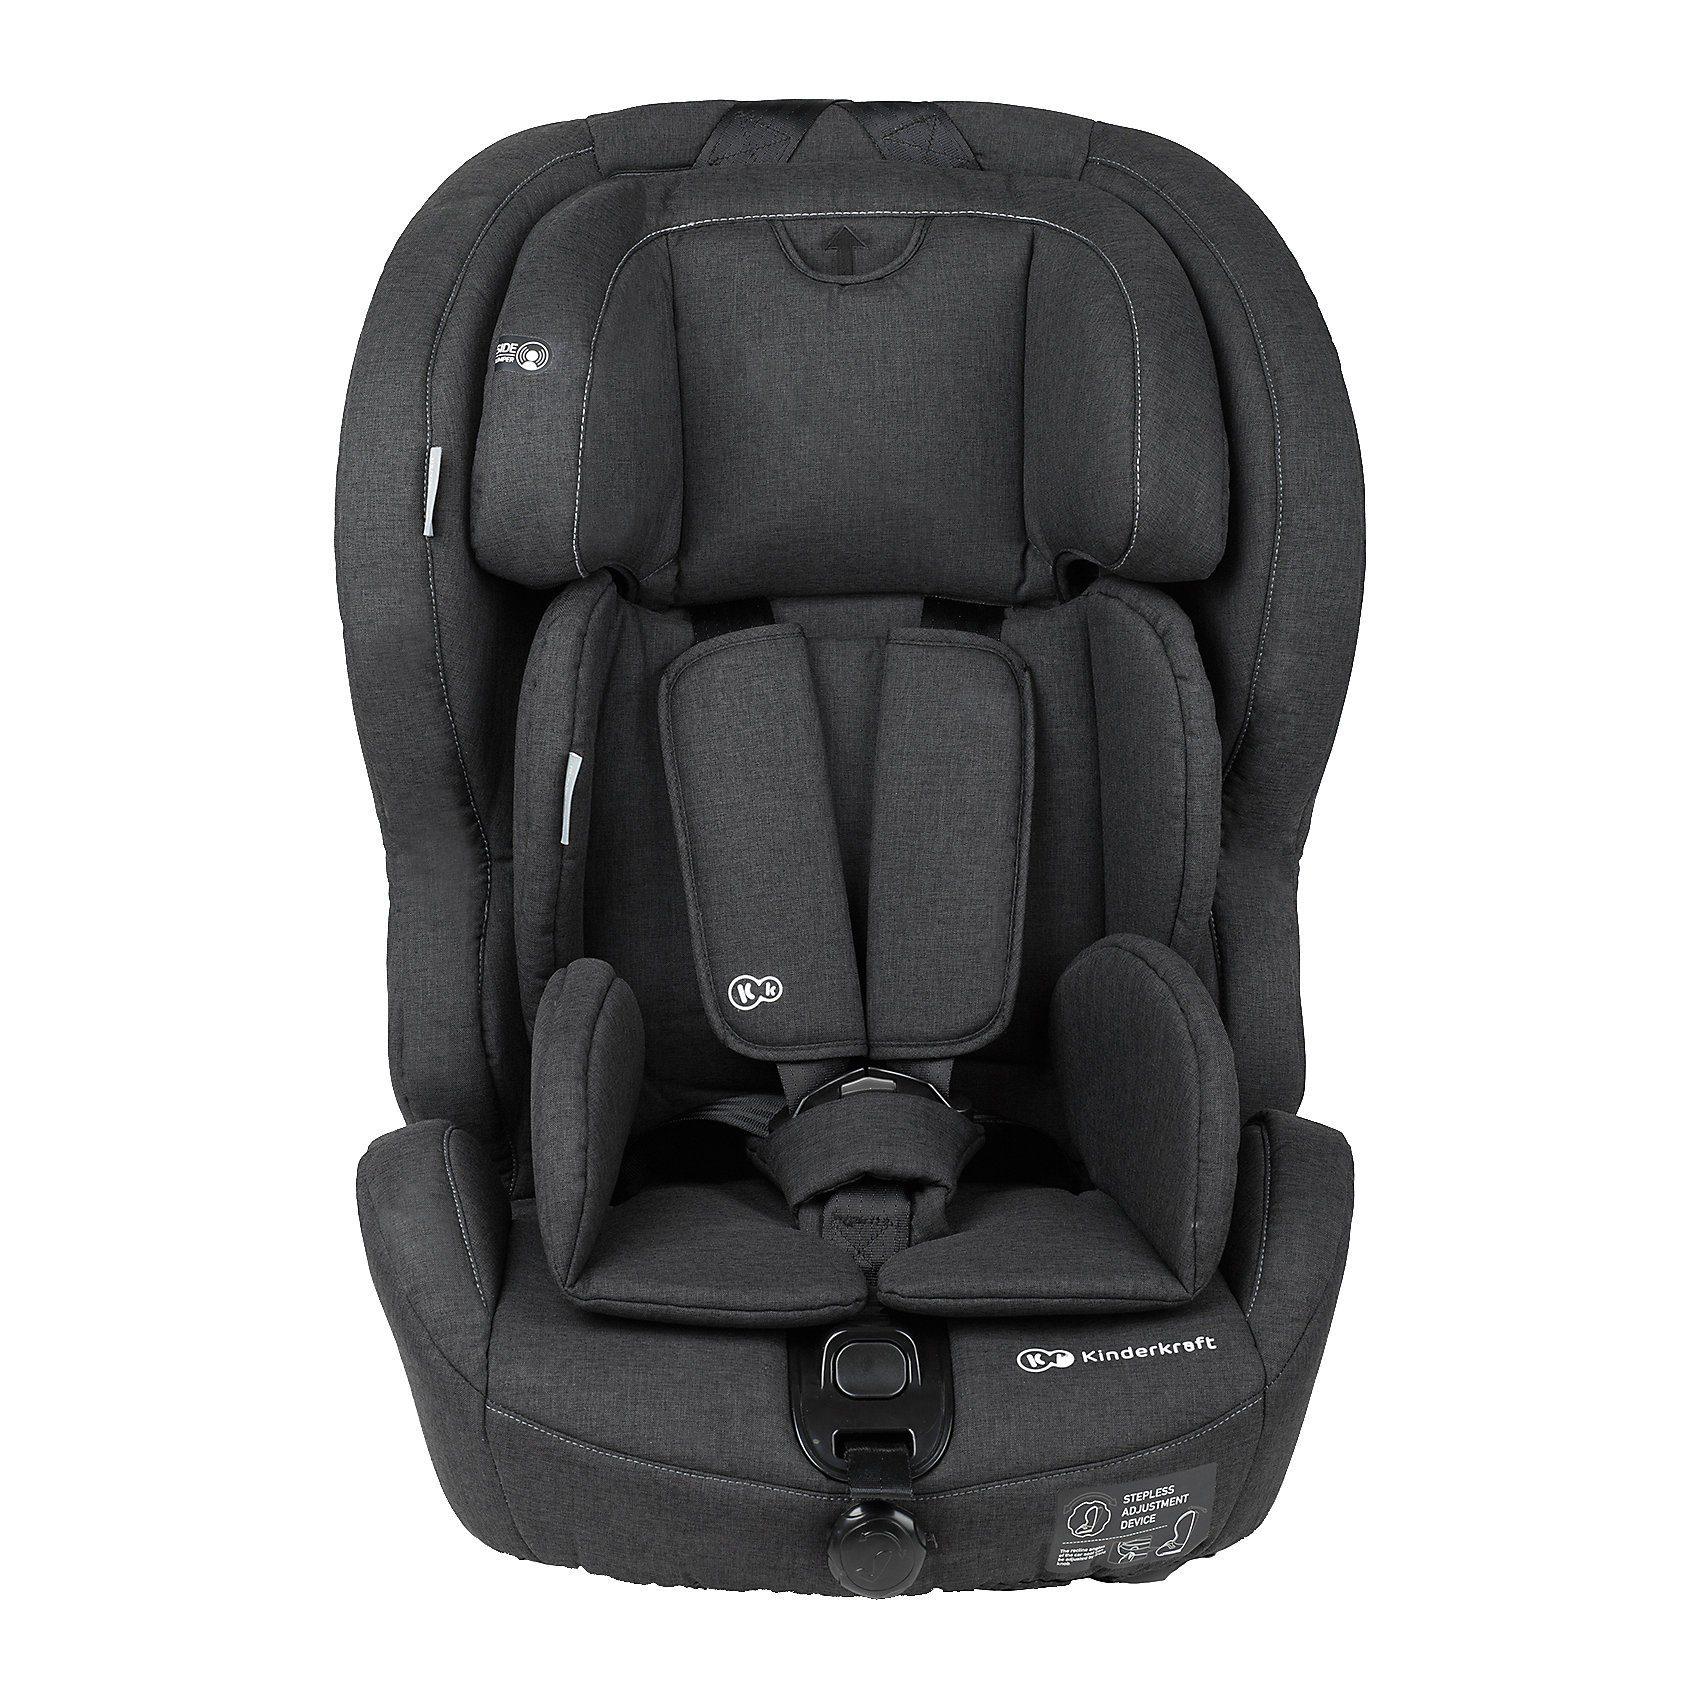 Kinderkraft Kinderautositz Safety-Fix, schwarz